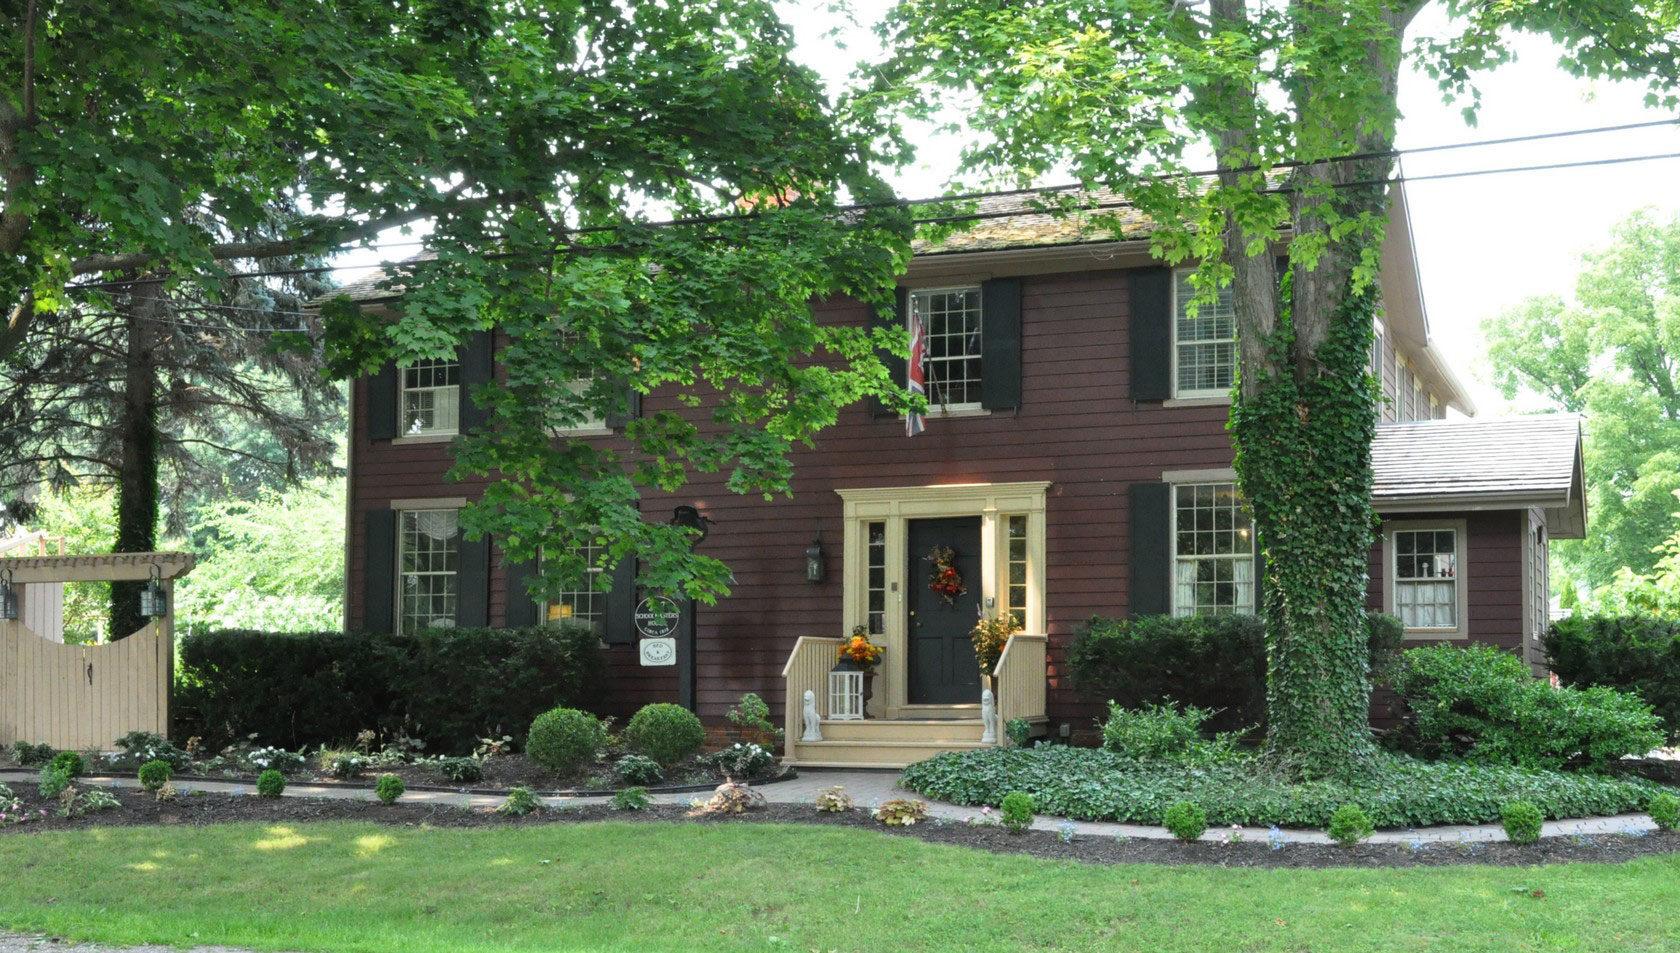 The Schoolmaster's House